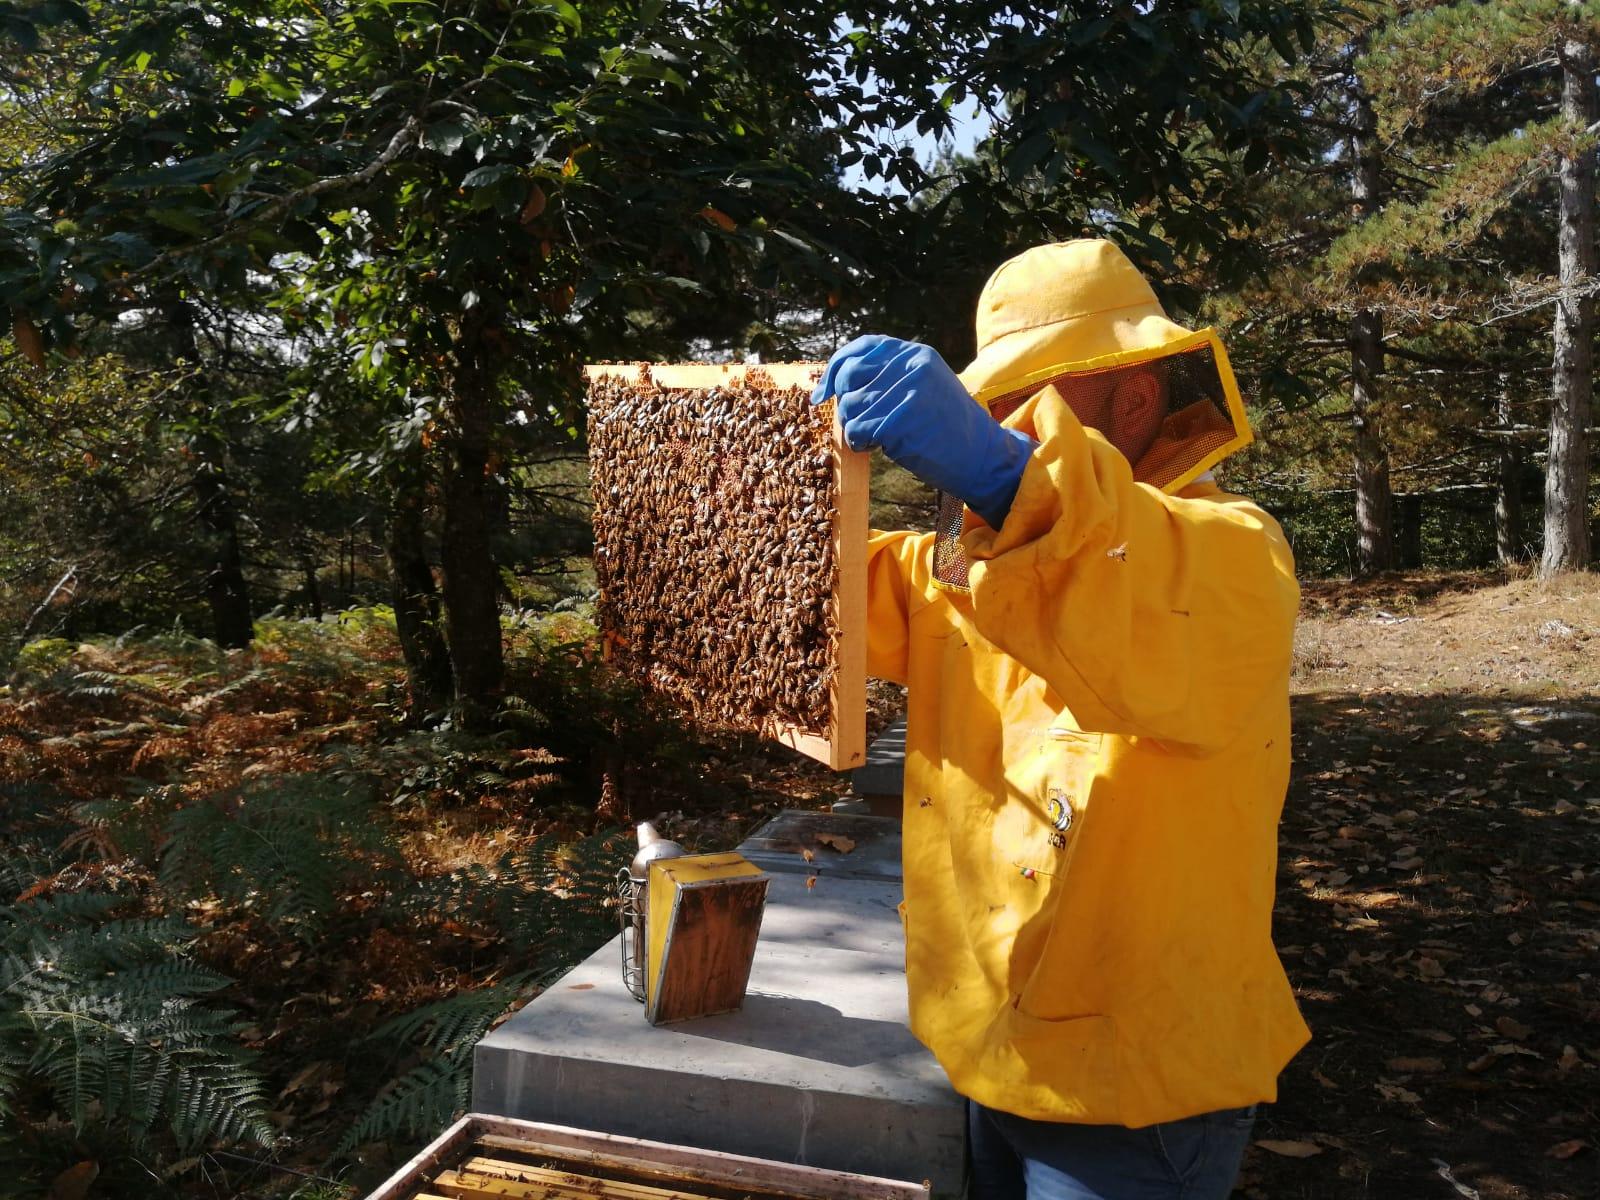 Controllo arnie e verifica salute api